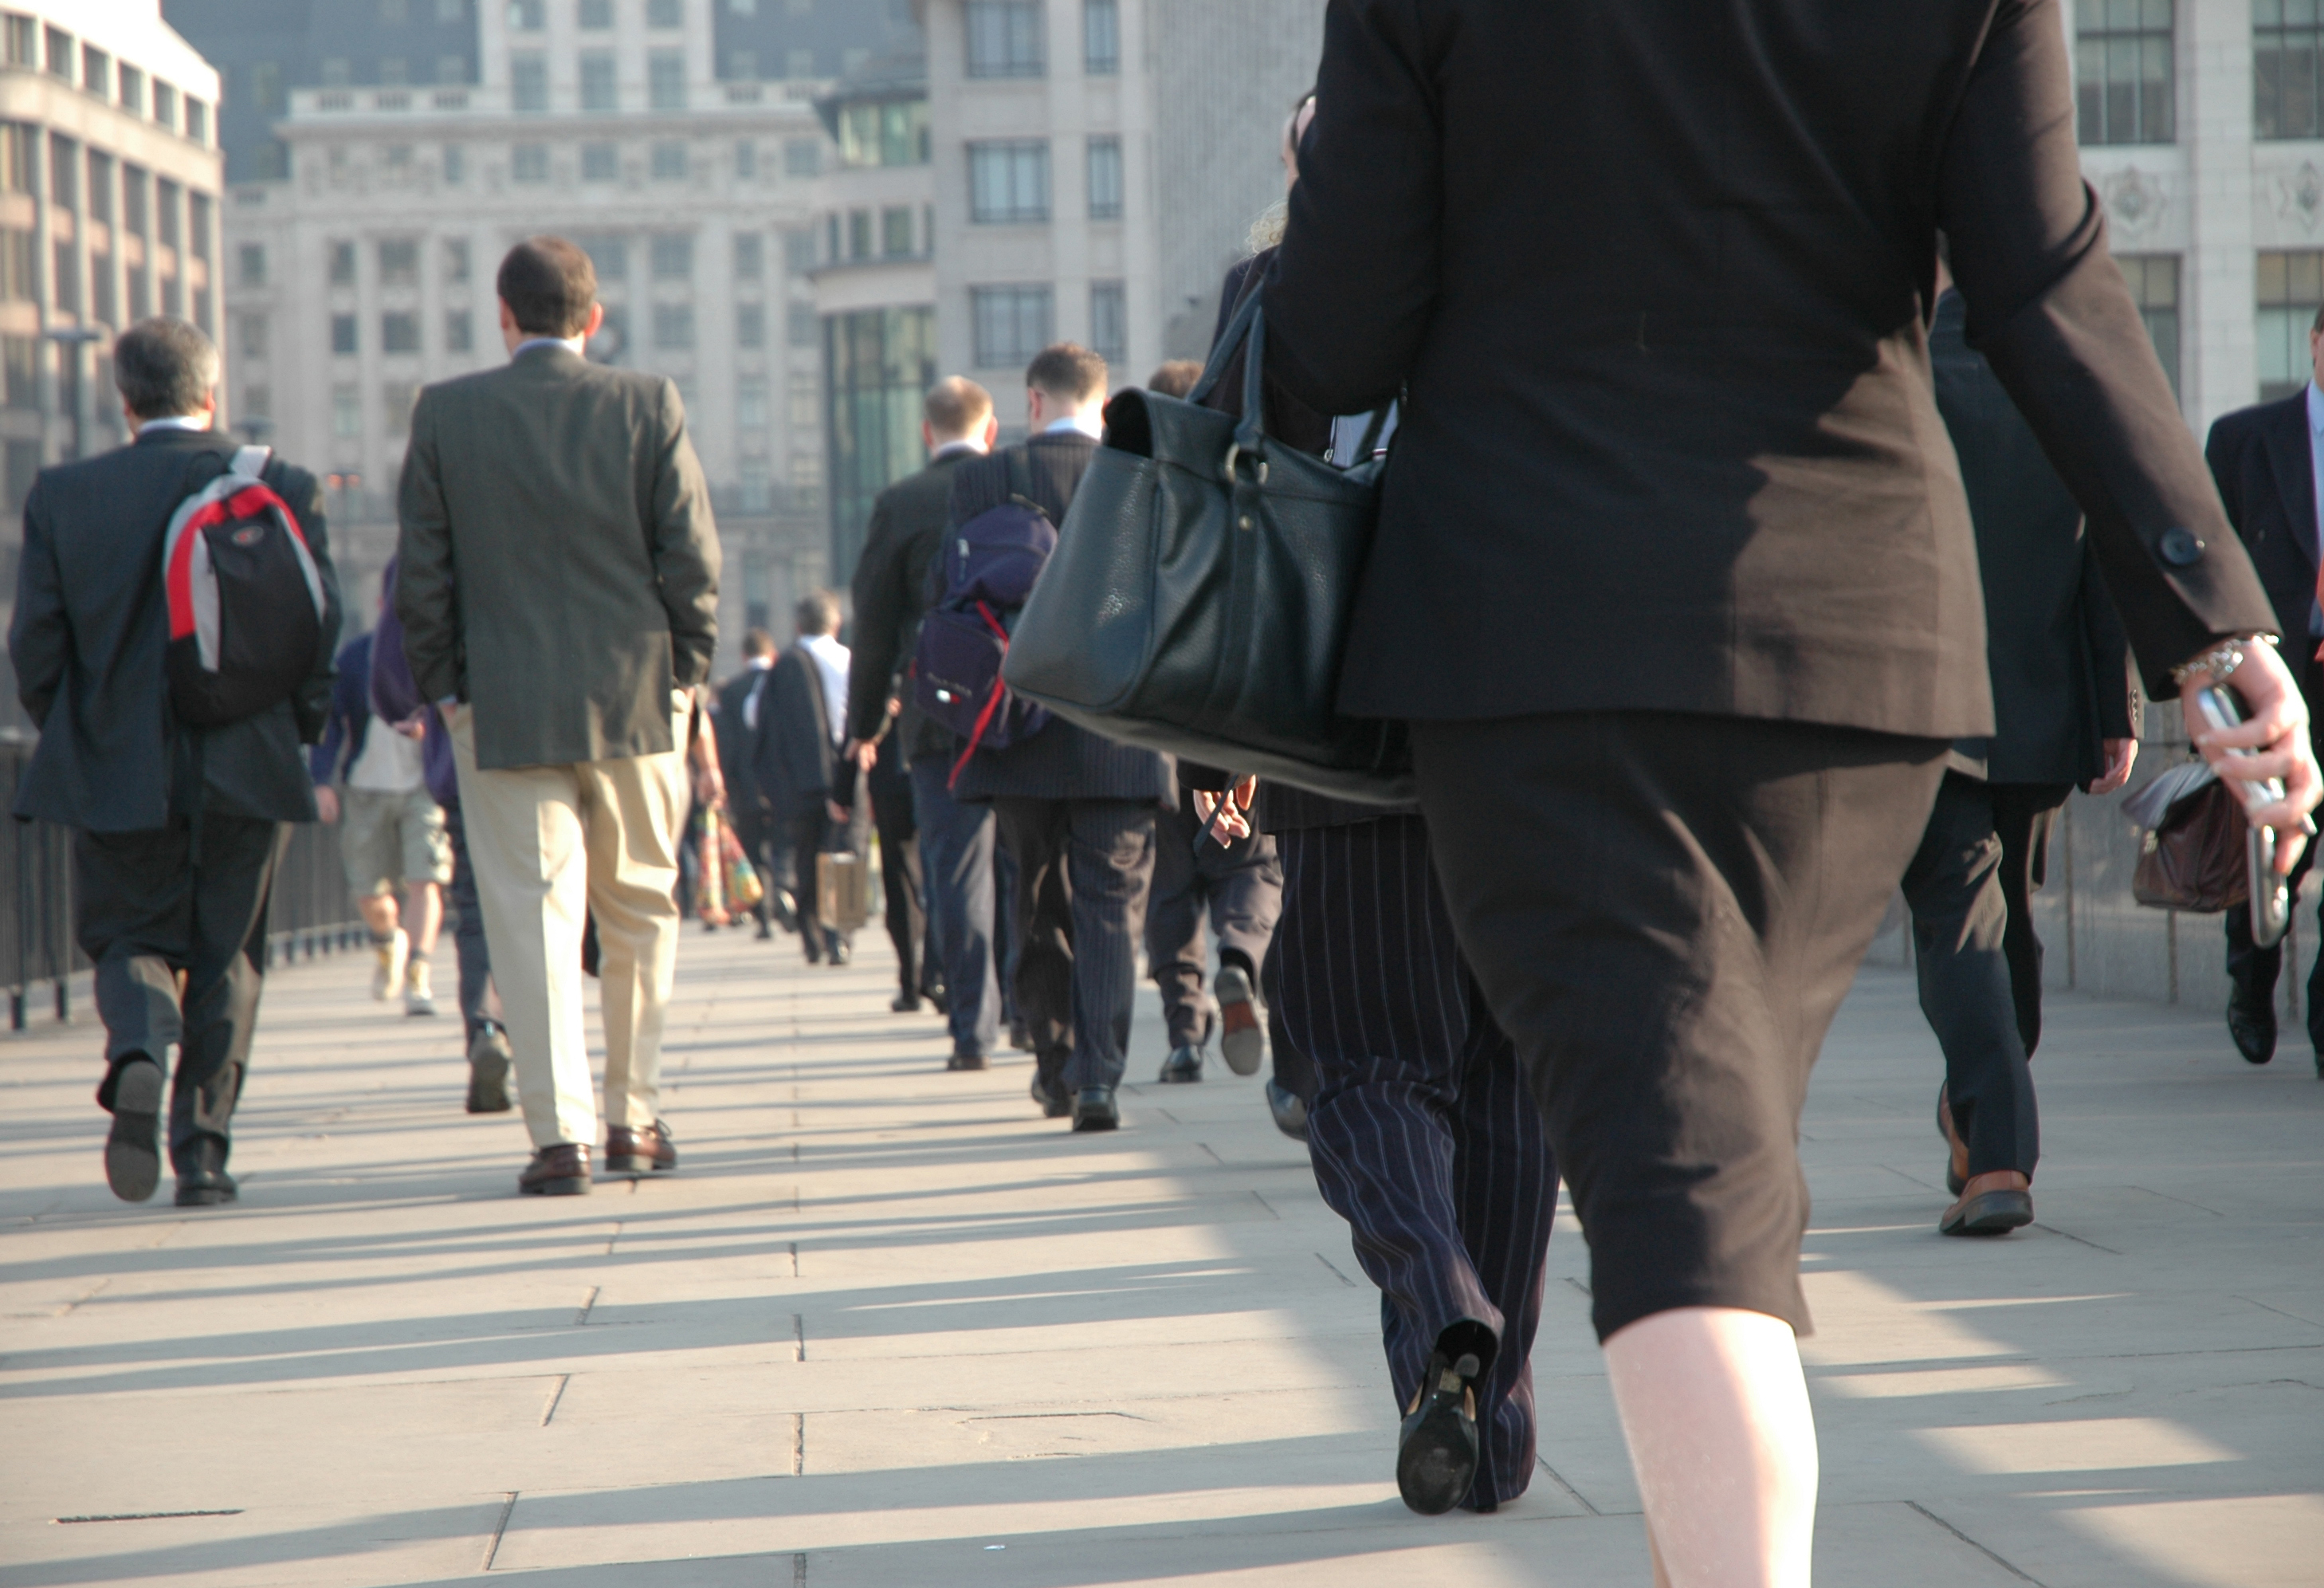 Women in the city